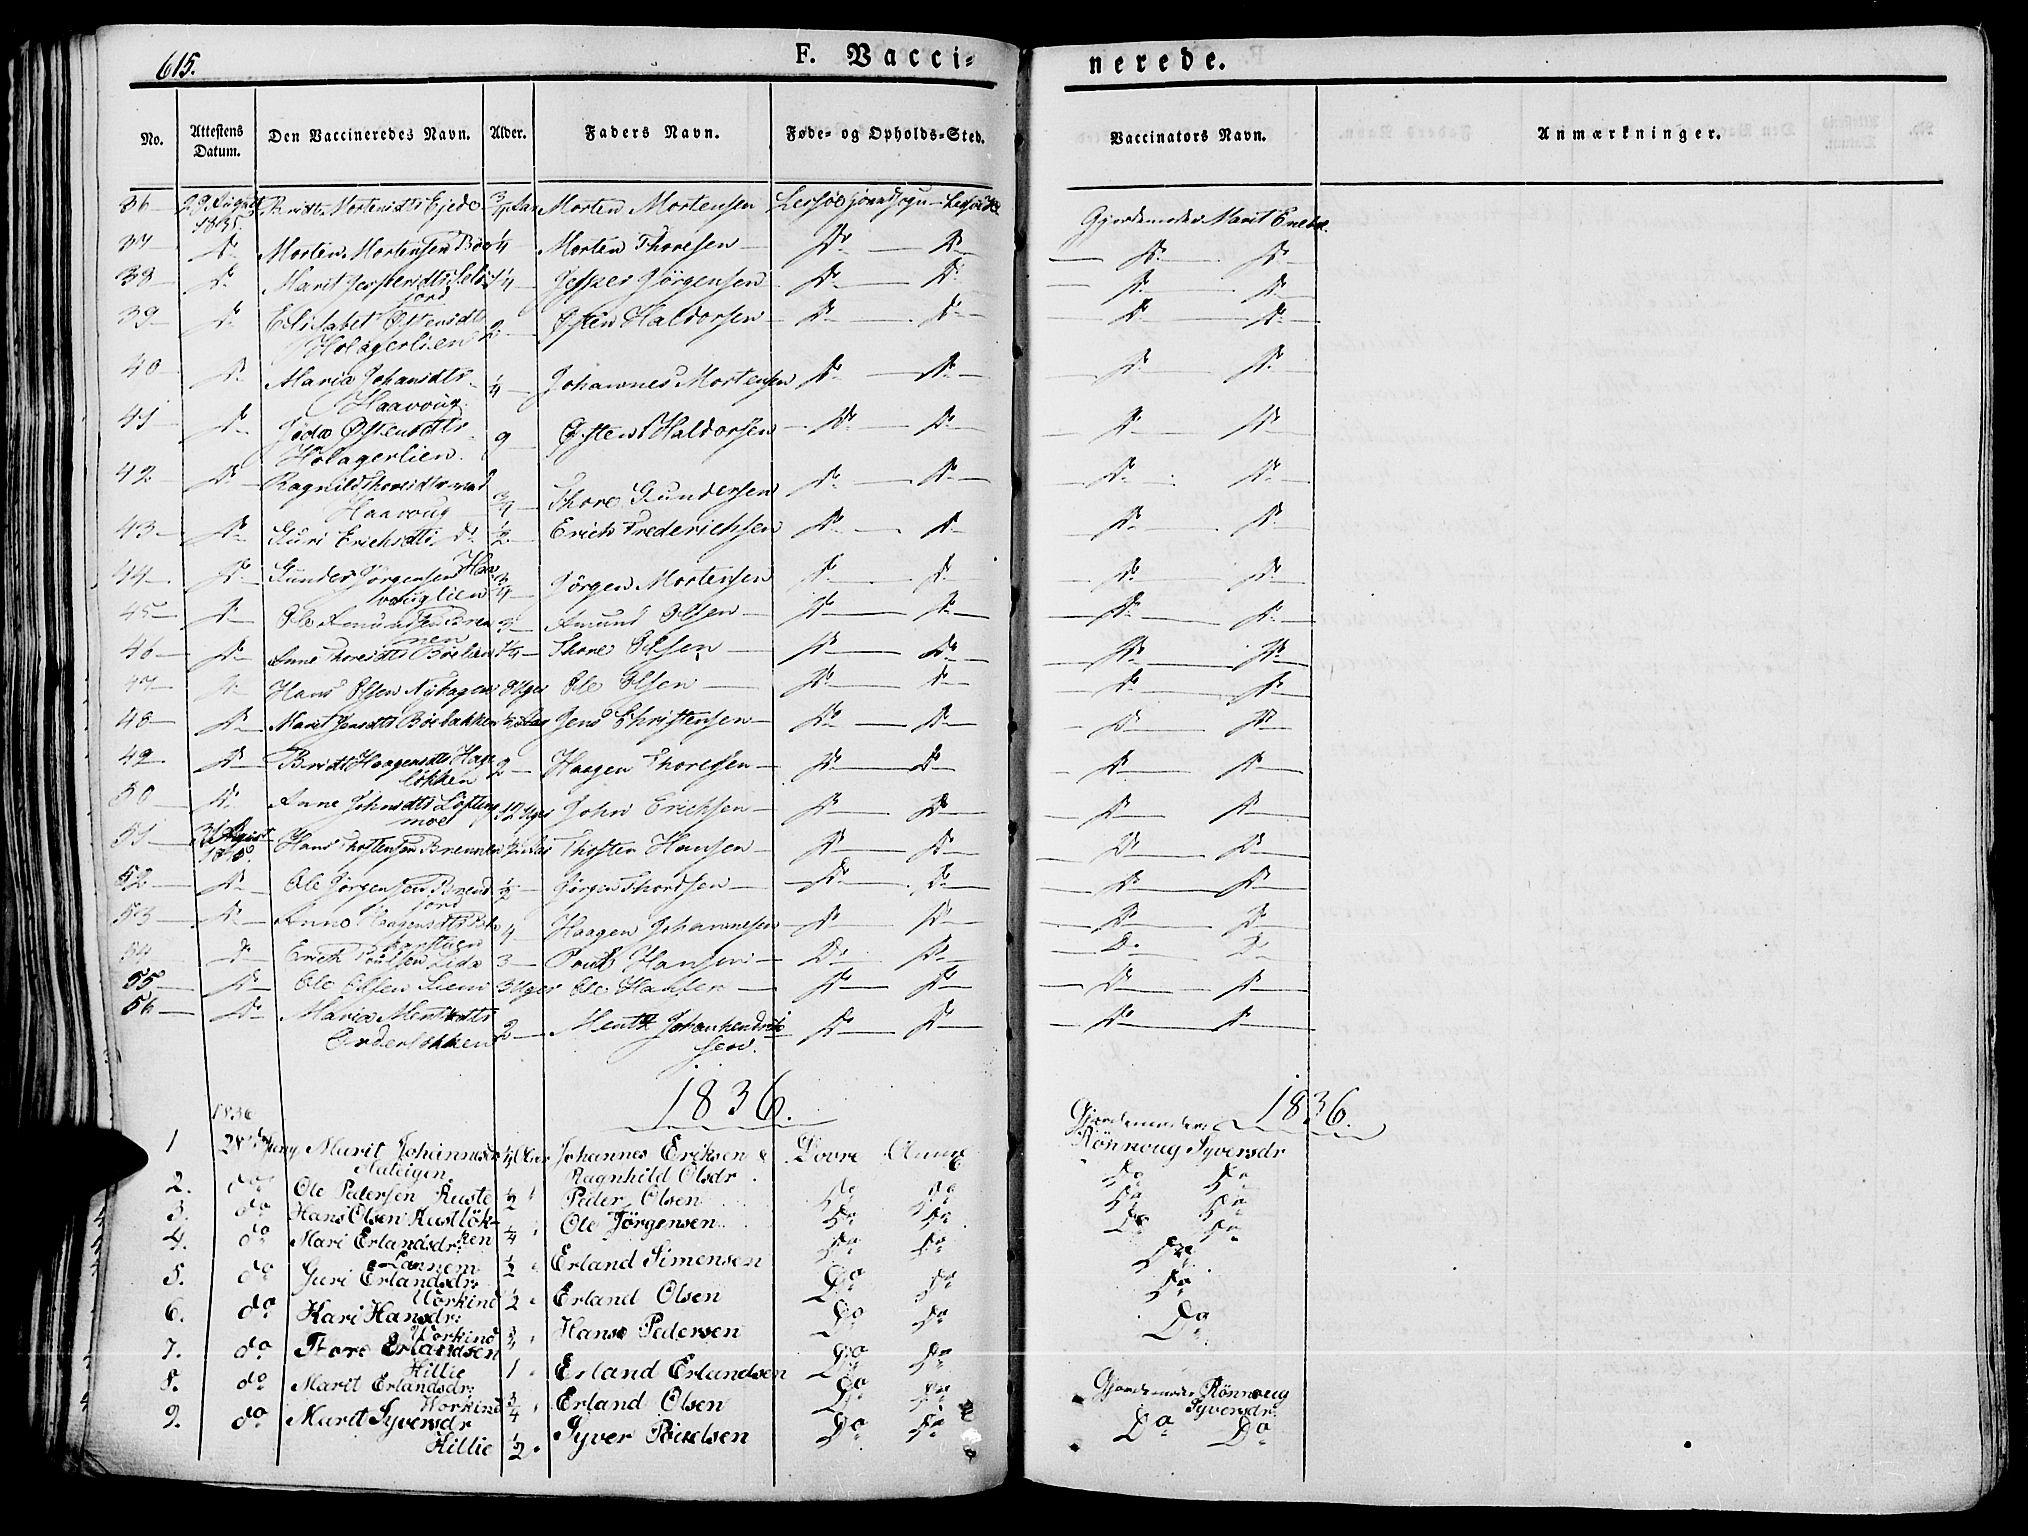 SAH, Lesja prestekontor, Ministerialbok nr. 5, 1830-1842, s. 615